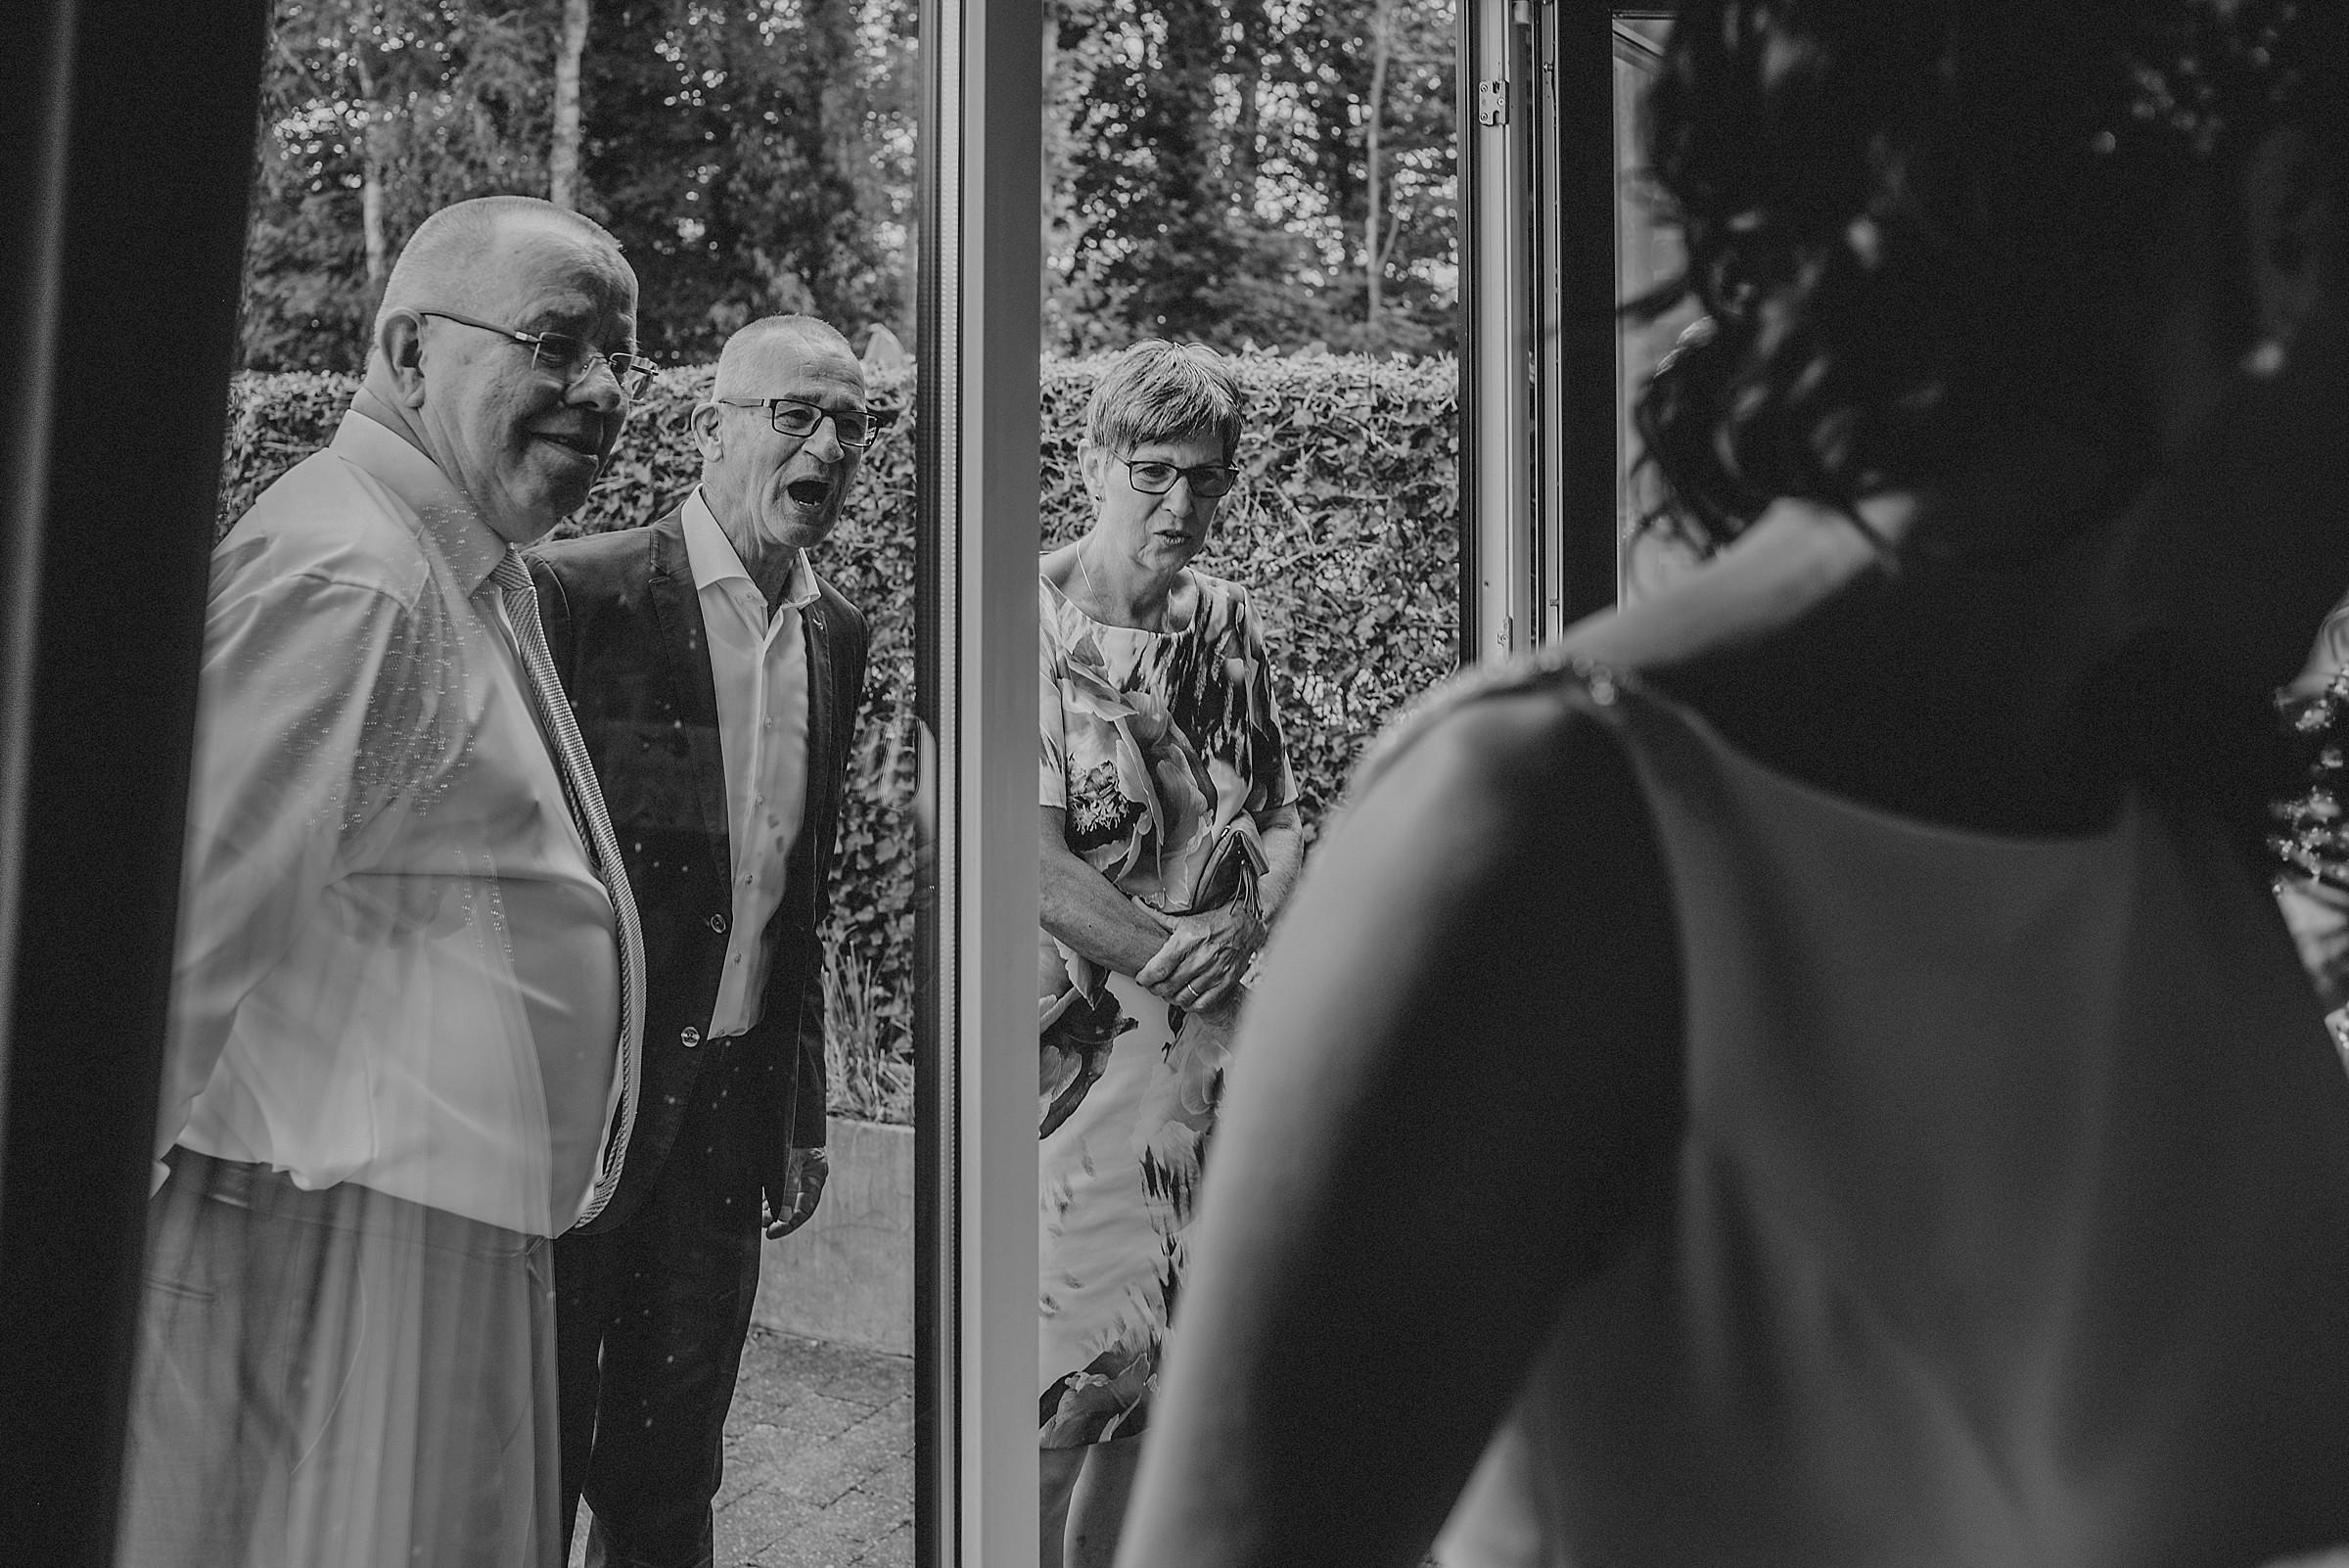 weddingbelgium_0019.jpg